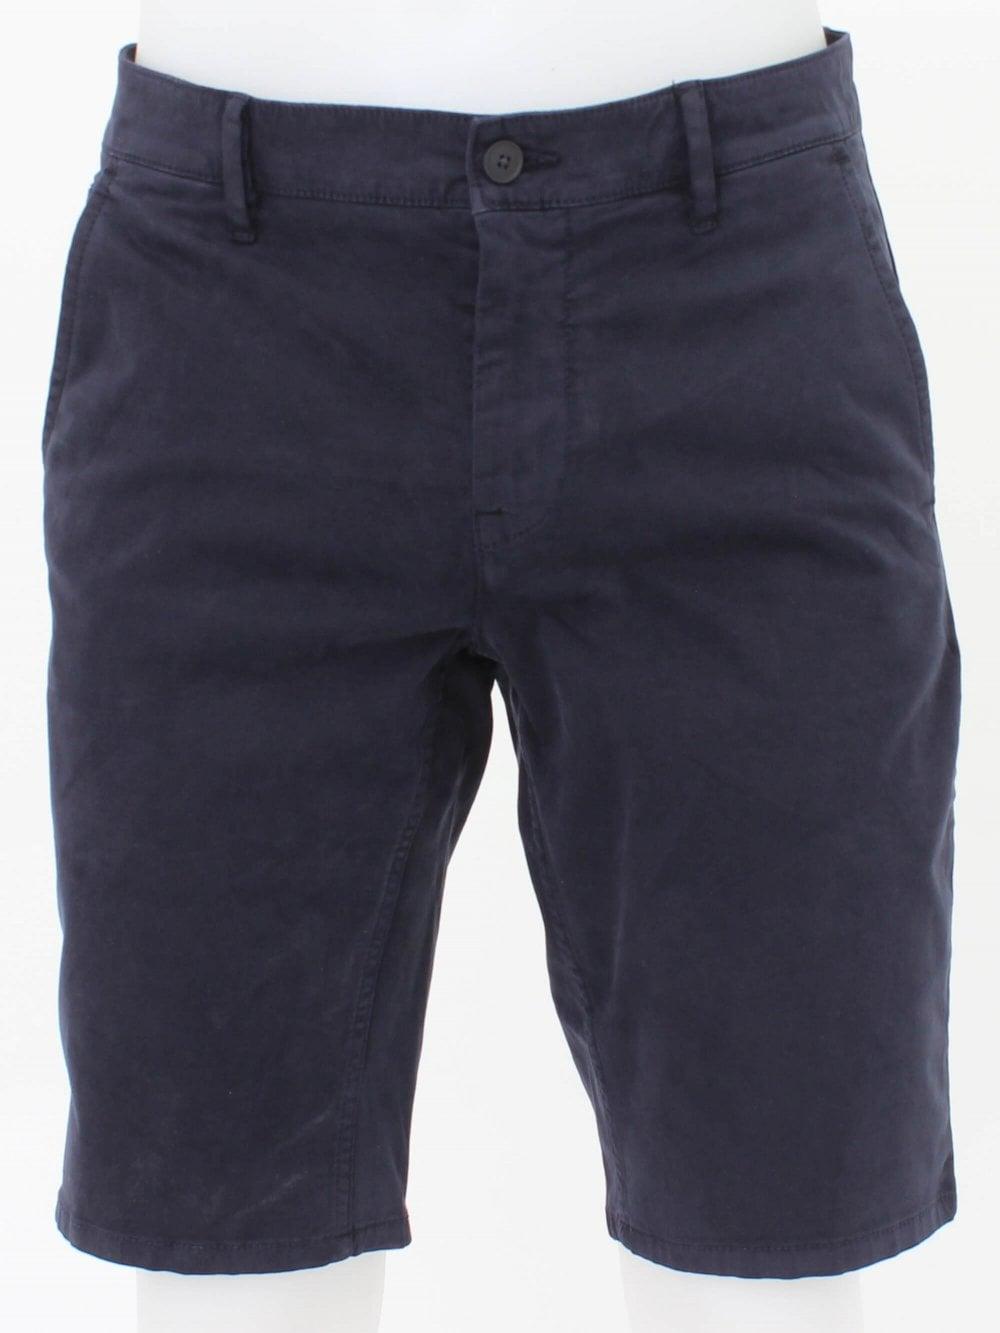 aae0eca4f Hugo Boss Casual Schino Slim Fit Shorts in Navy | Northern Threads